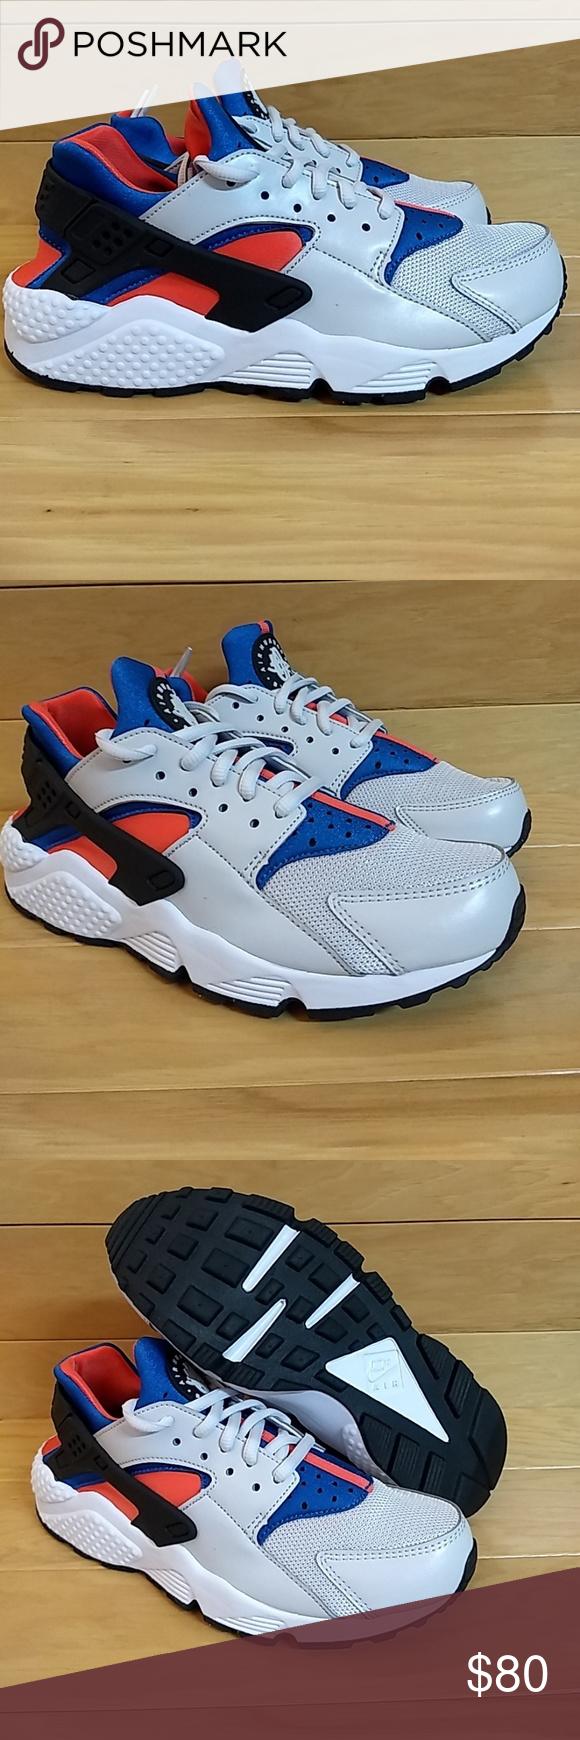 1108d97e43c6 Nike Air Huarache Run Grey Black Coral Wmns Shoe Item  Nike Wmns Air  Huarache Run Code  634835-031 Official Colorway  Vast Grey Black-…